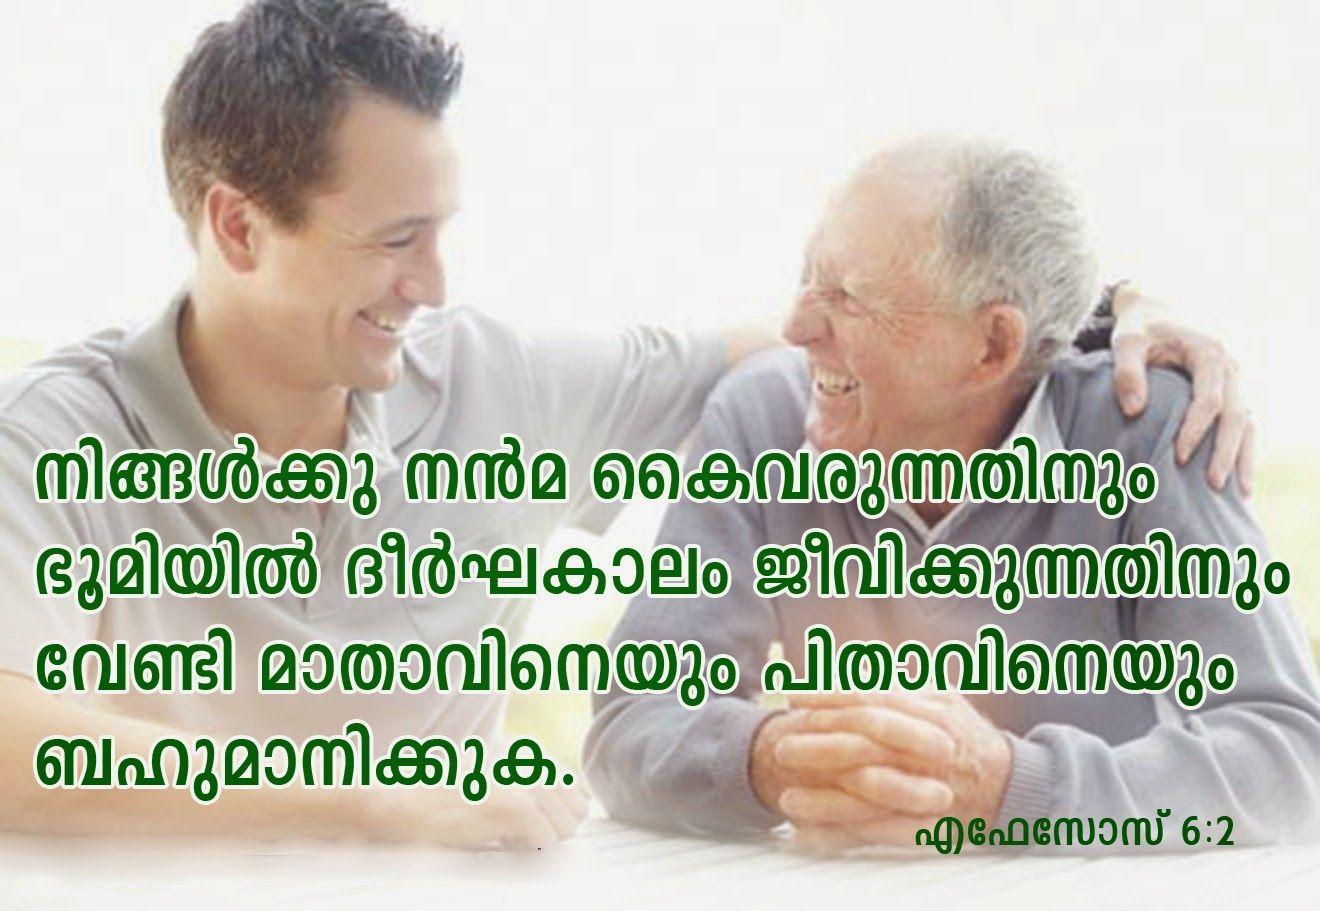 Malayalam Bible Quotes Kerala Catholics Malayalam Bible Quotes